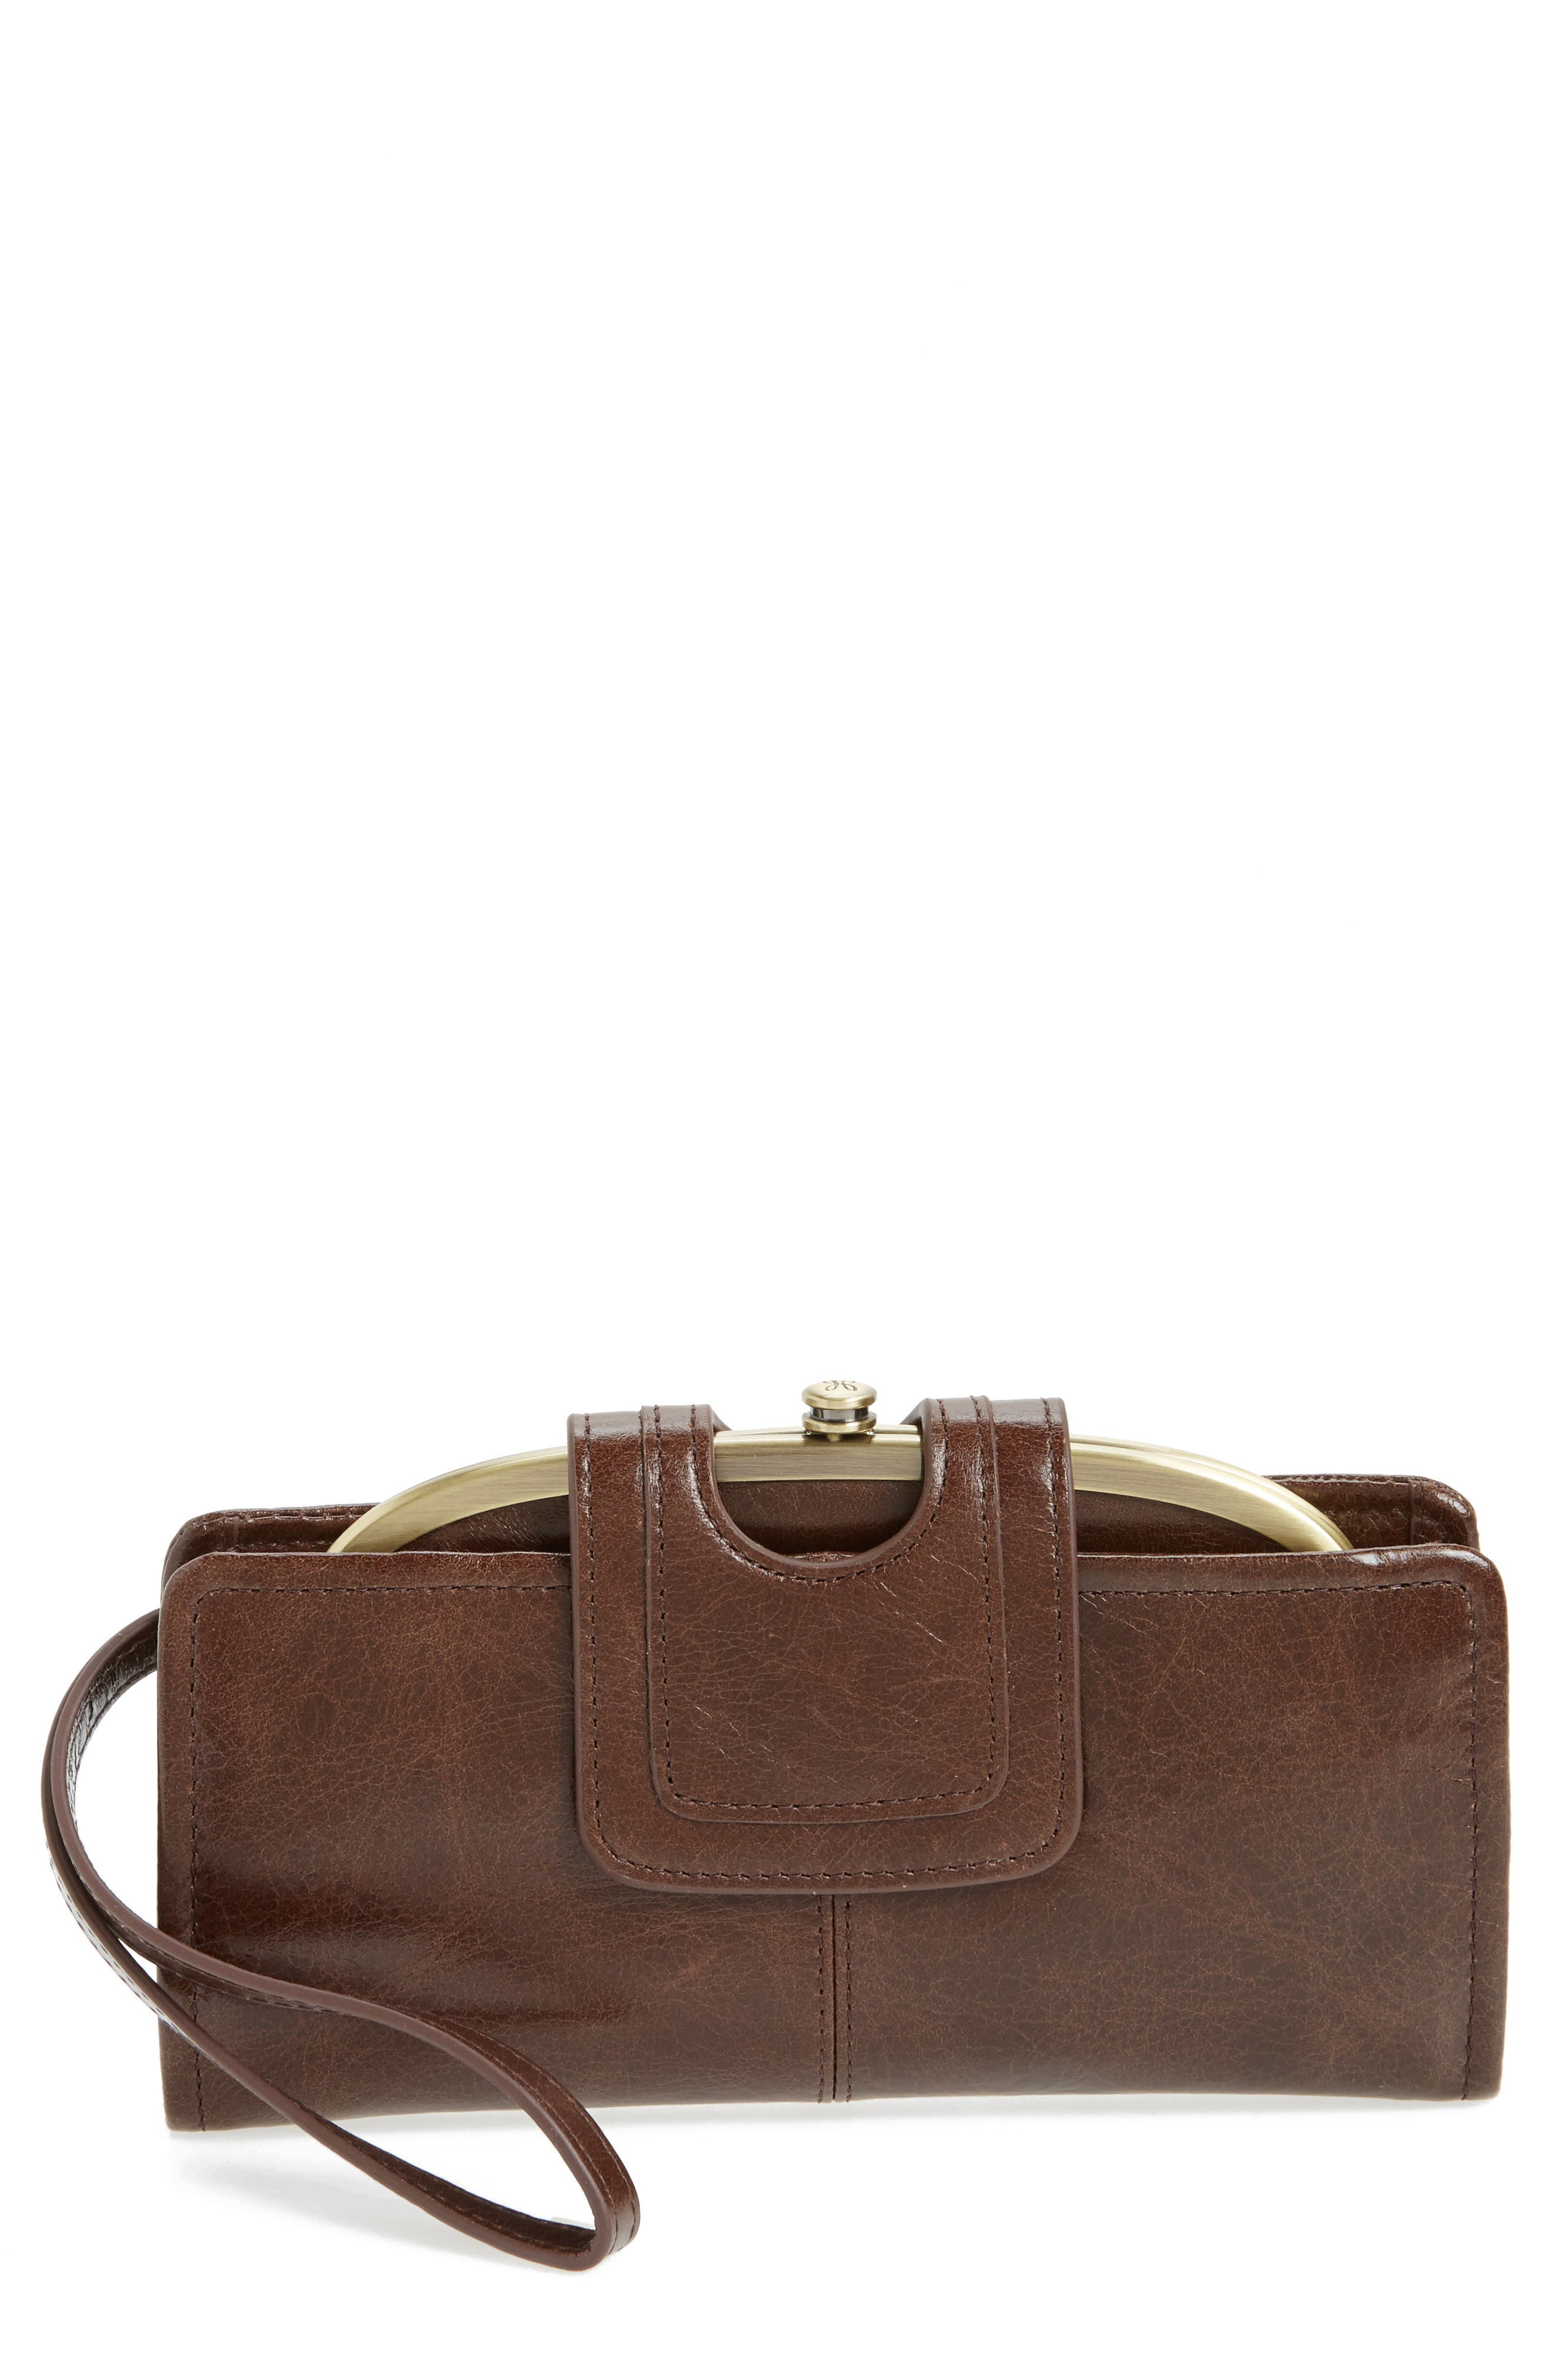 Main Image - Hobo Nova Calfskin Leather Wallet